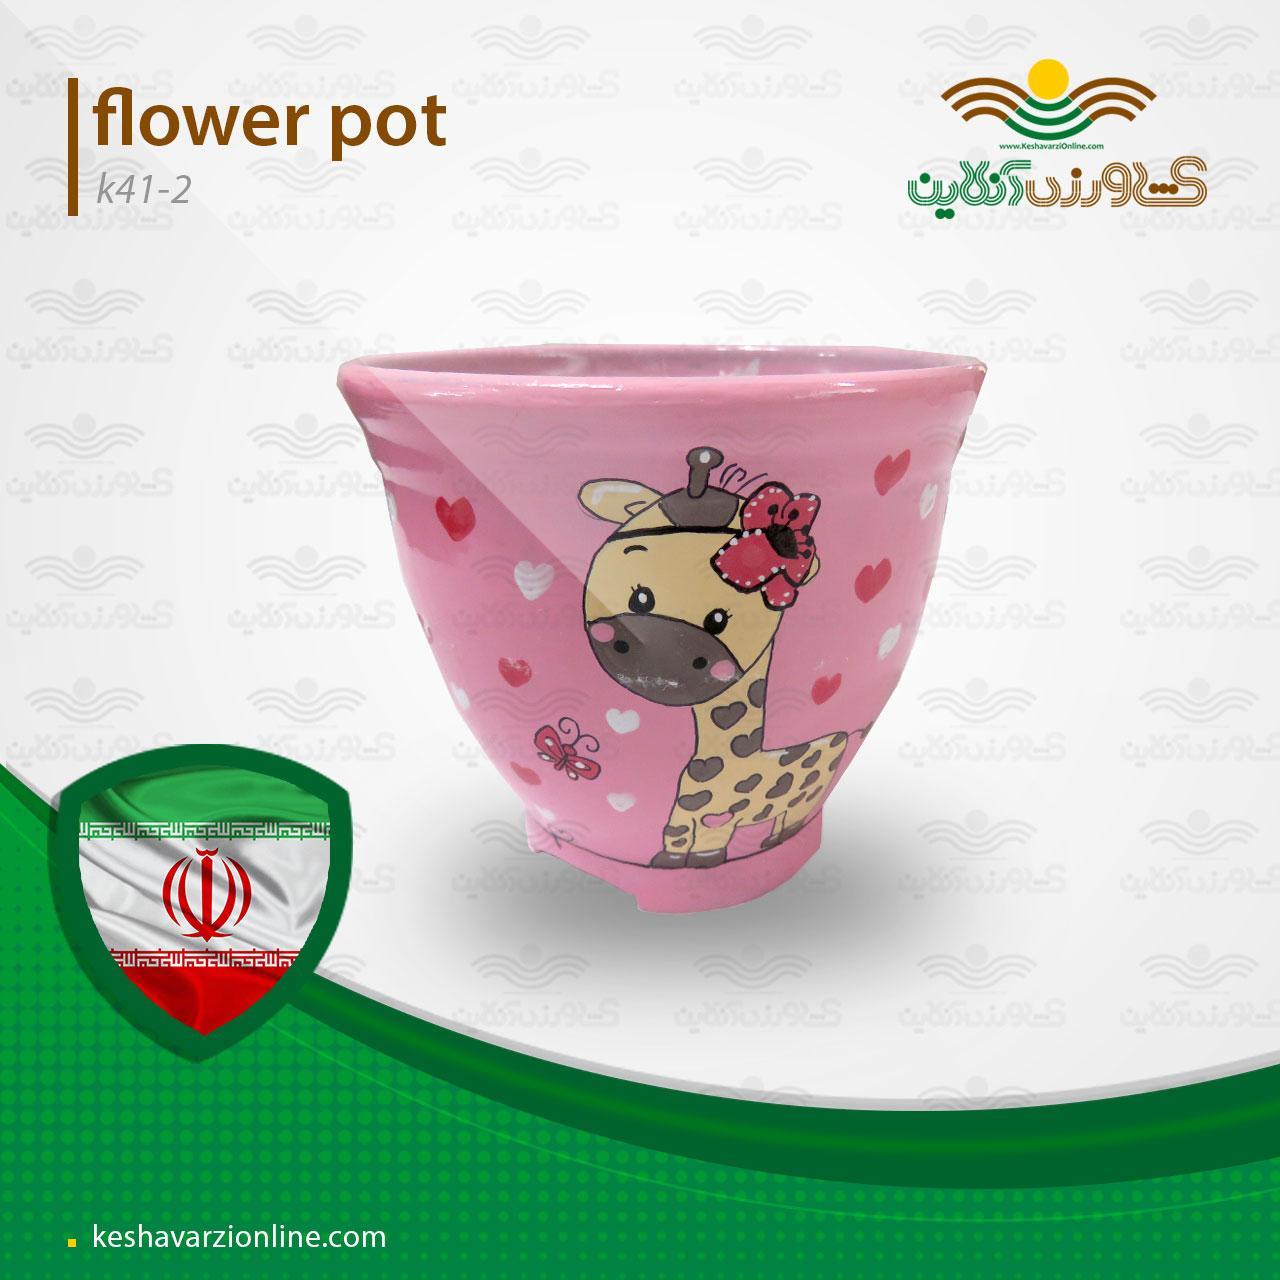 گلدان دکوری K41.2